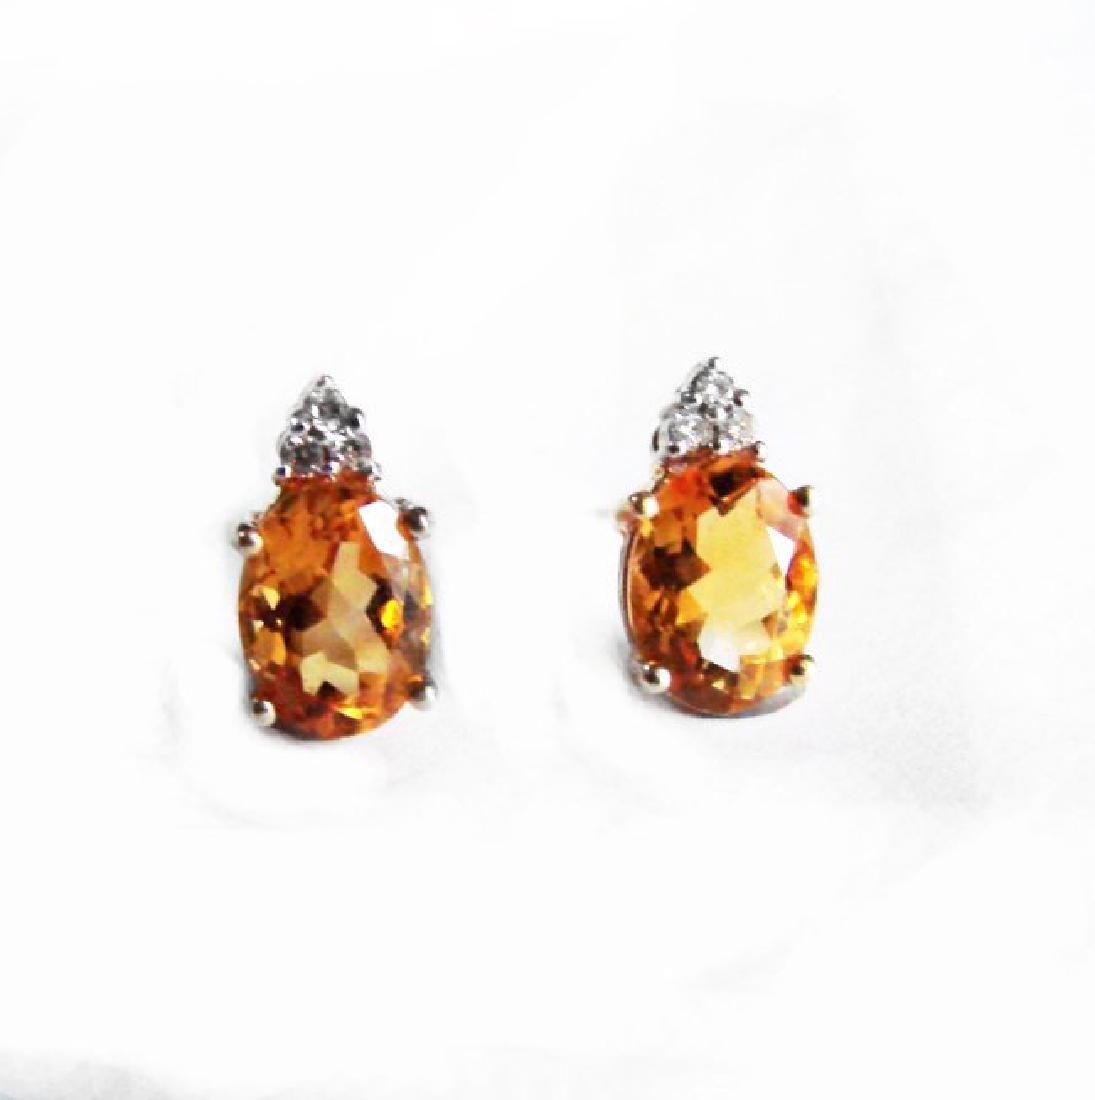 Golden Citrine Diamond Stud Earrings 2.64Ct 14k Y/G